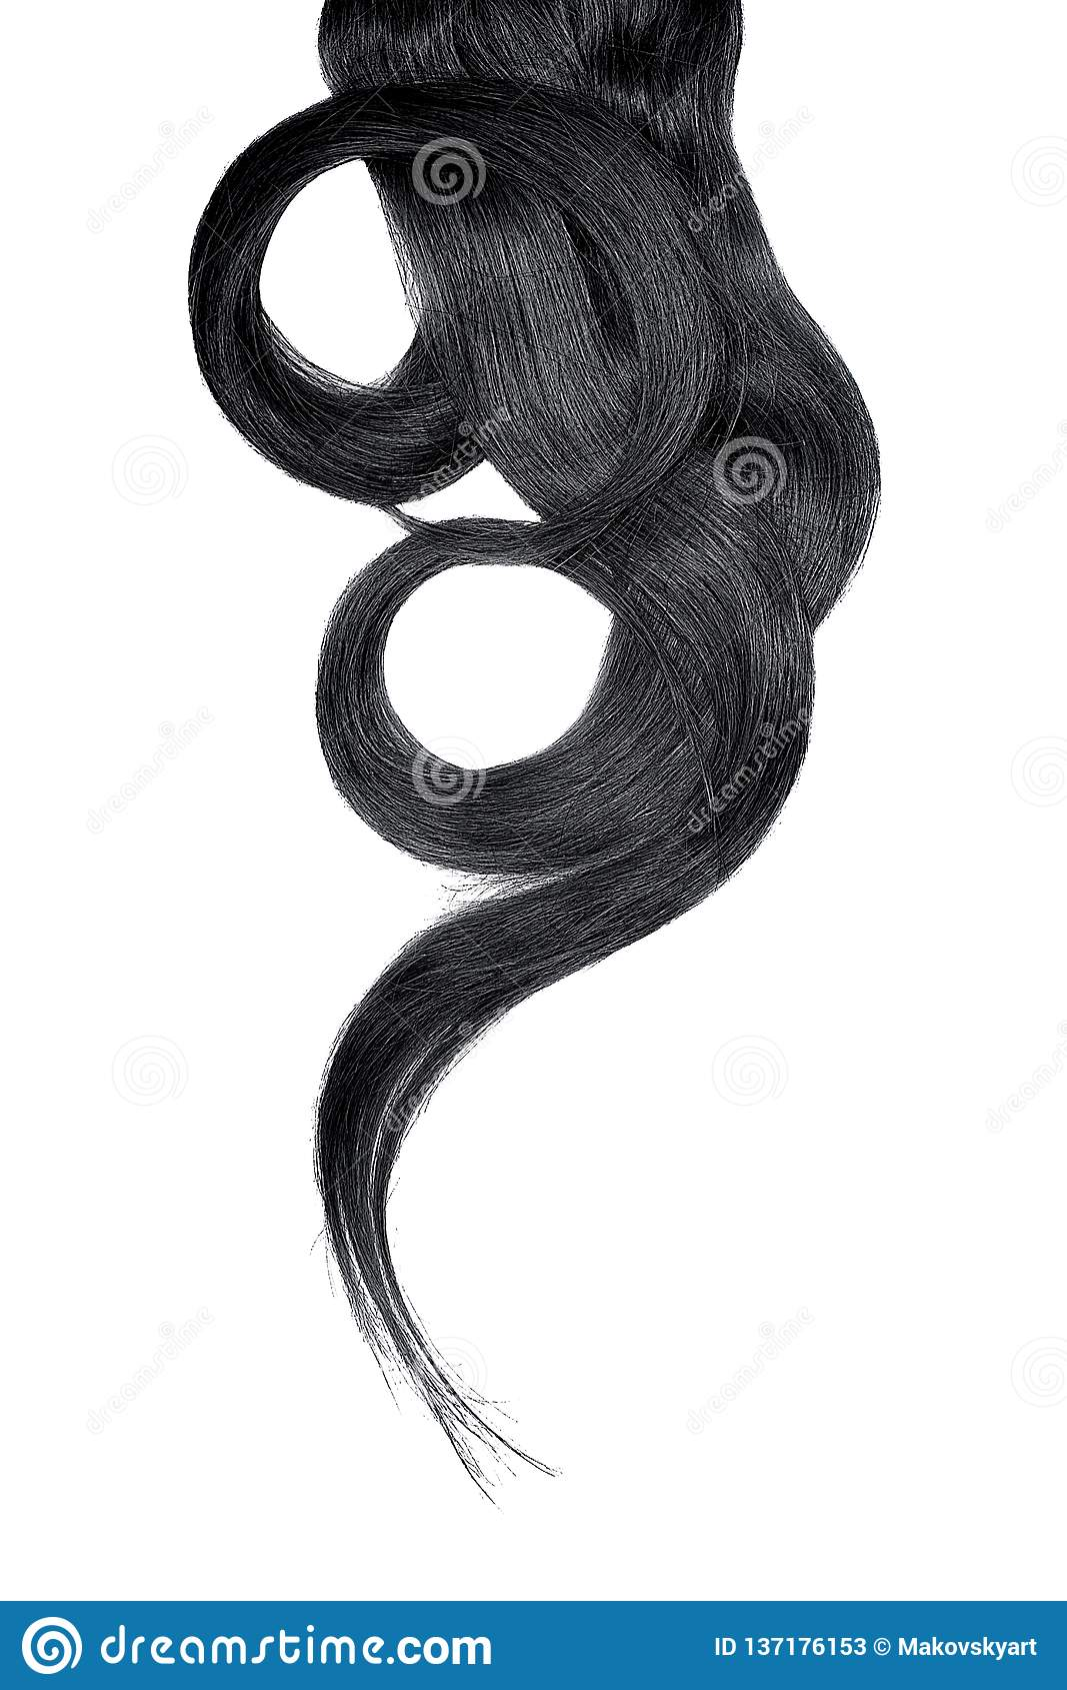 Cabelo preto isolado no fundo branco Rabo de cavalo bonito longo na forma do círculo